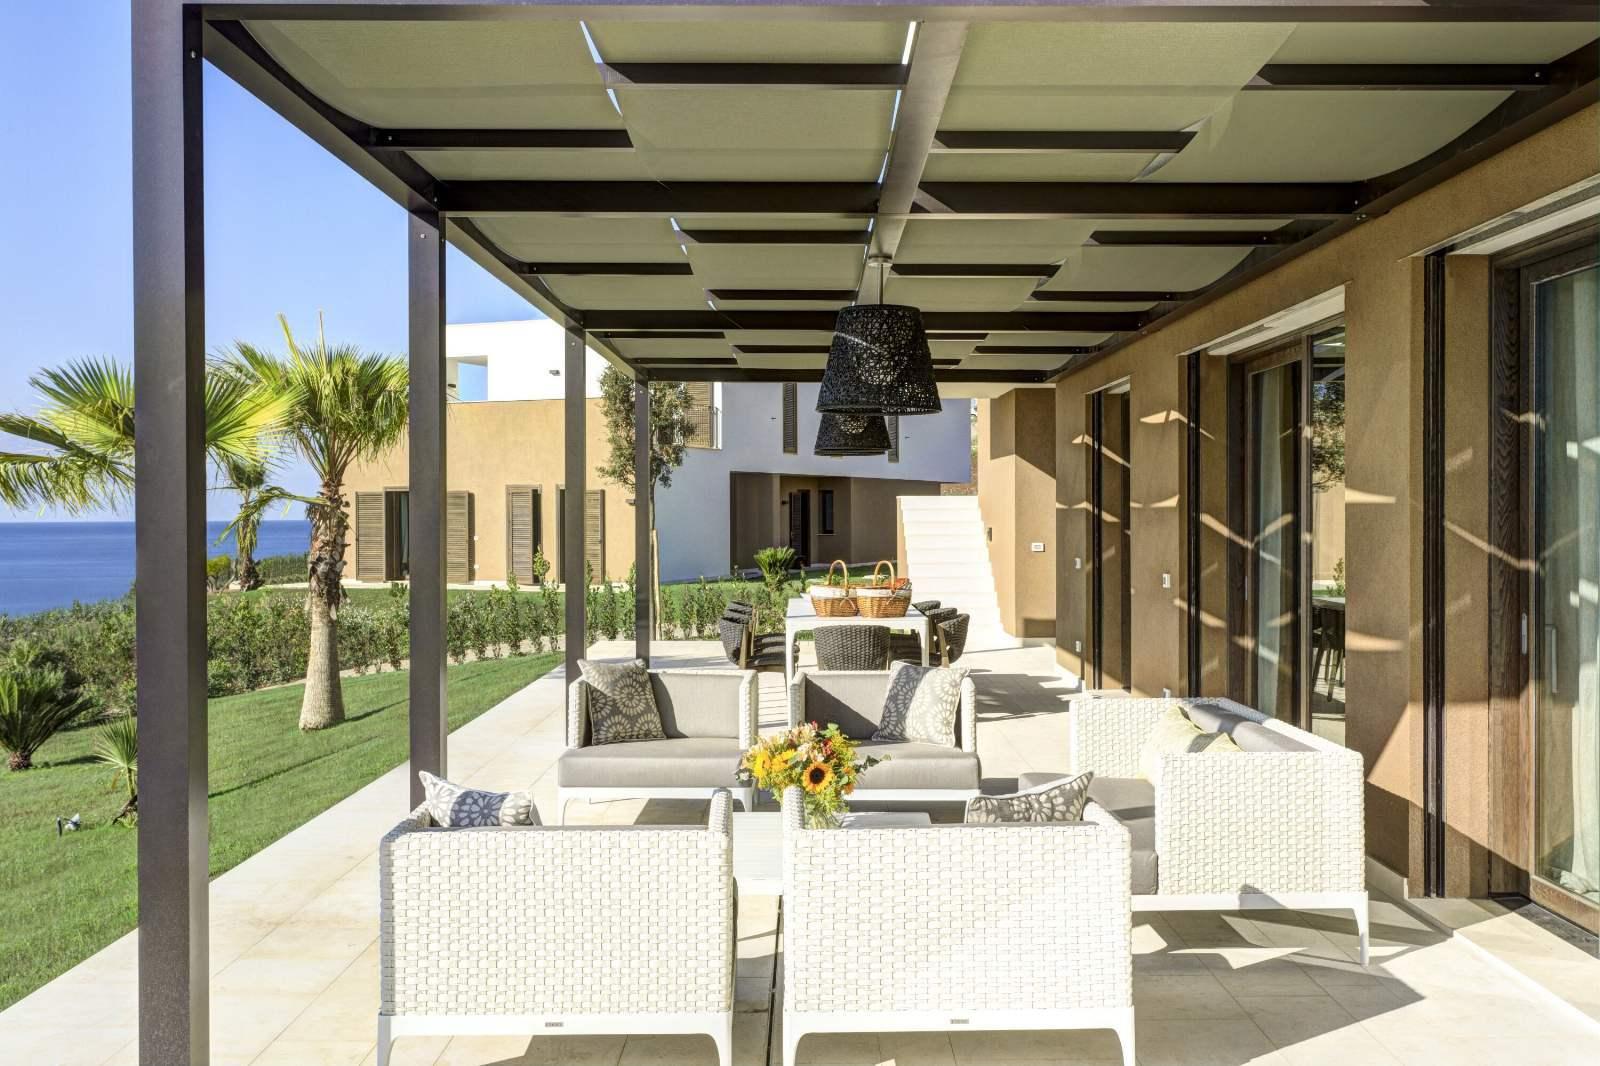 Verdura Resort: Private Villas: room / property / locale photo. Image 4